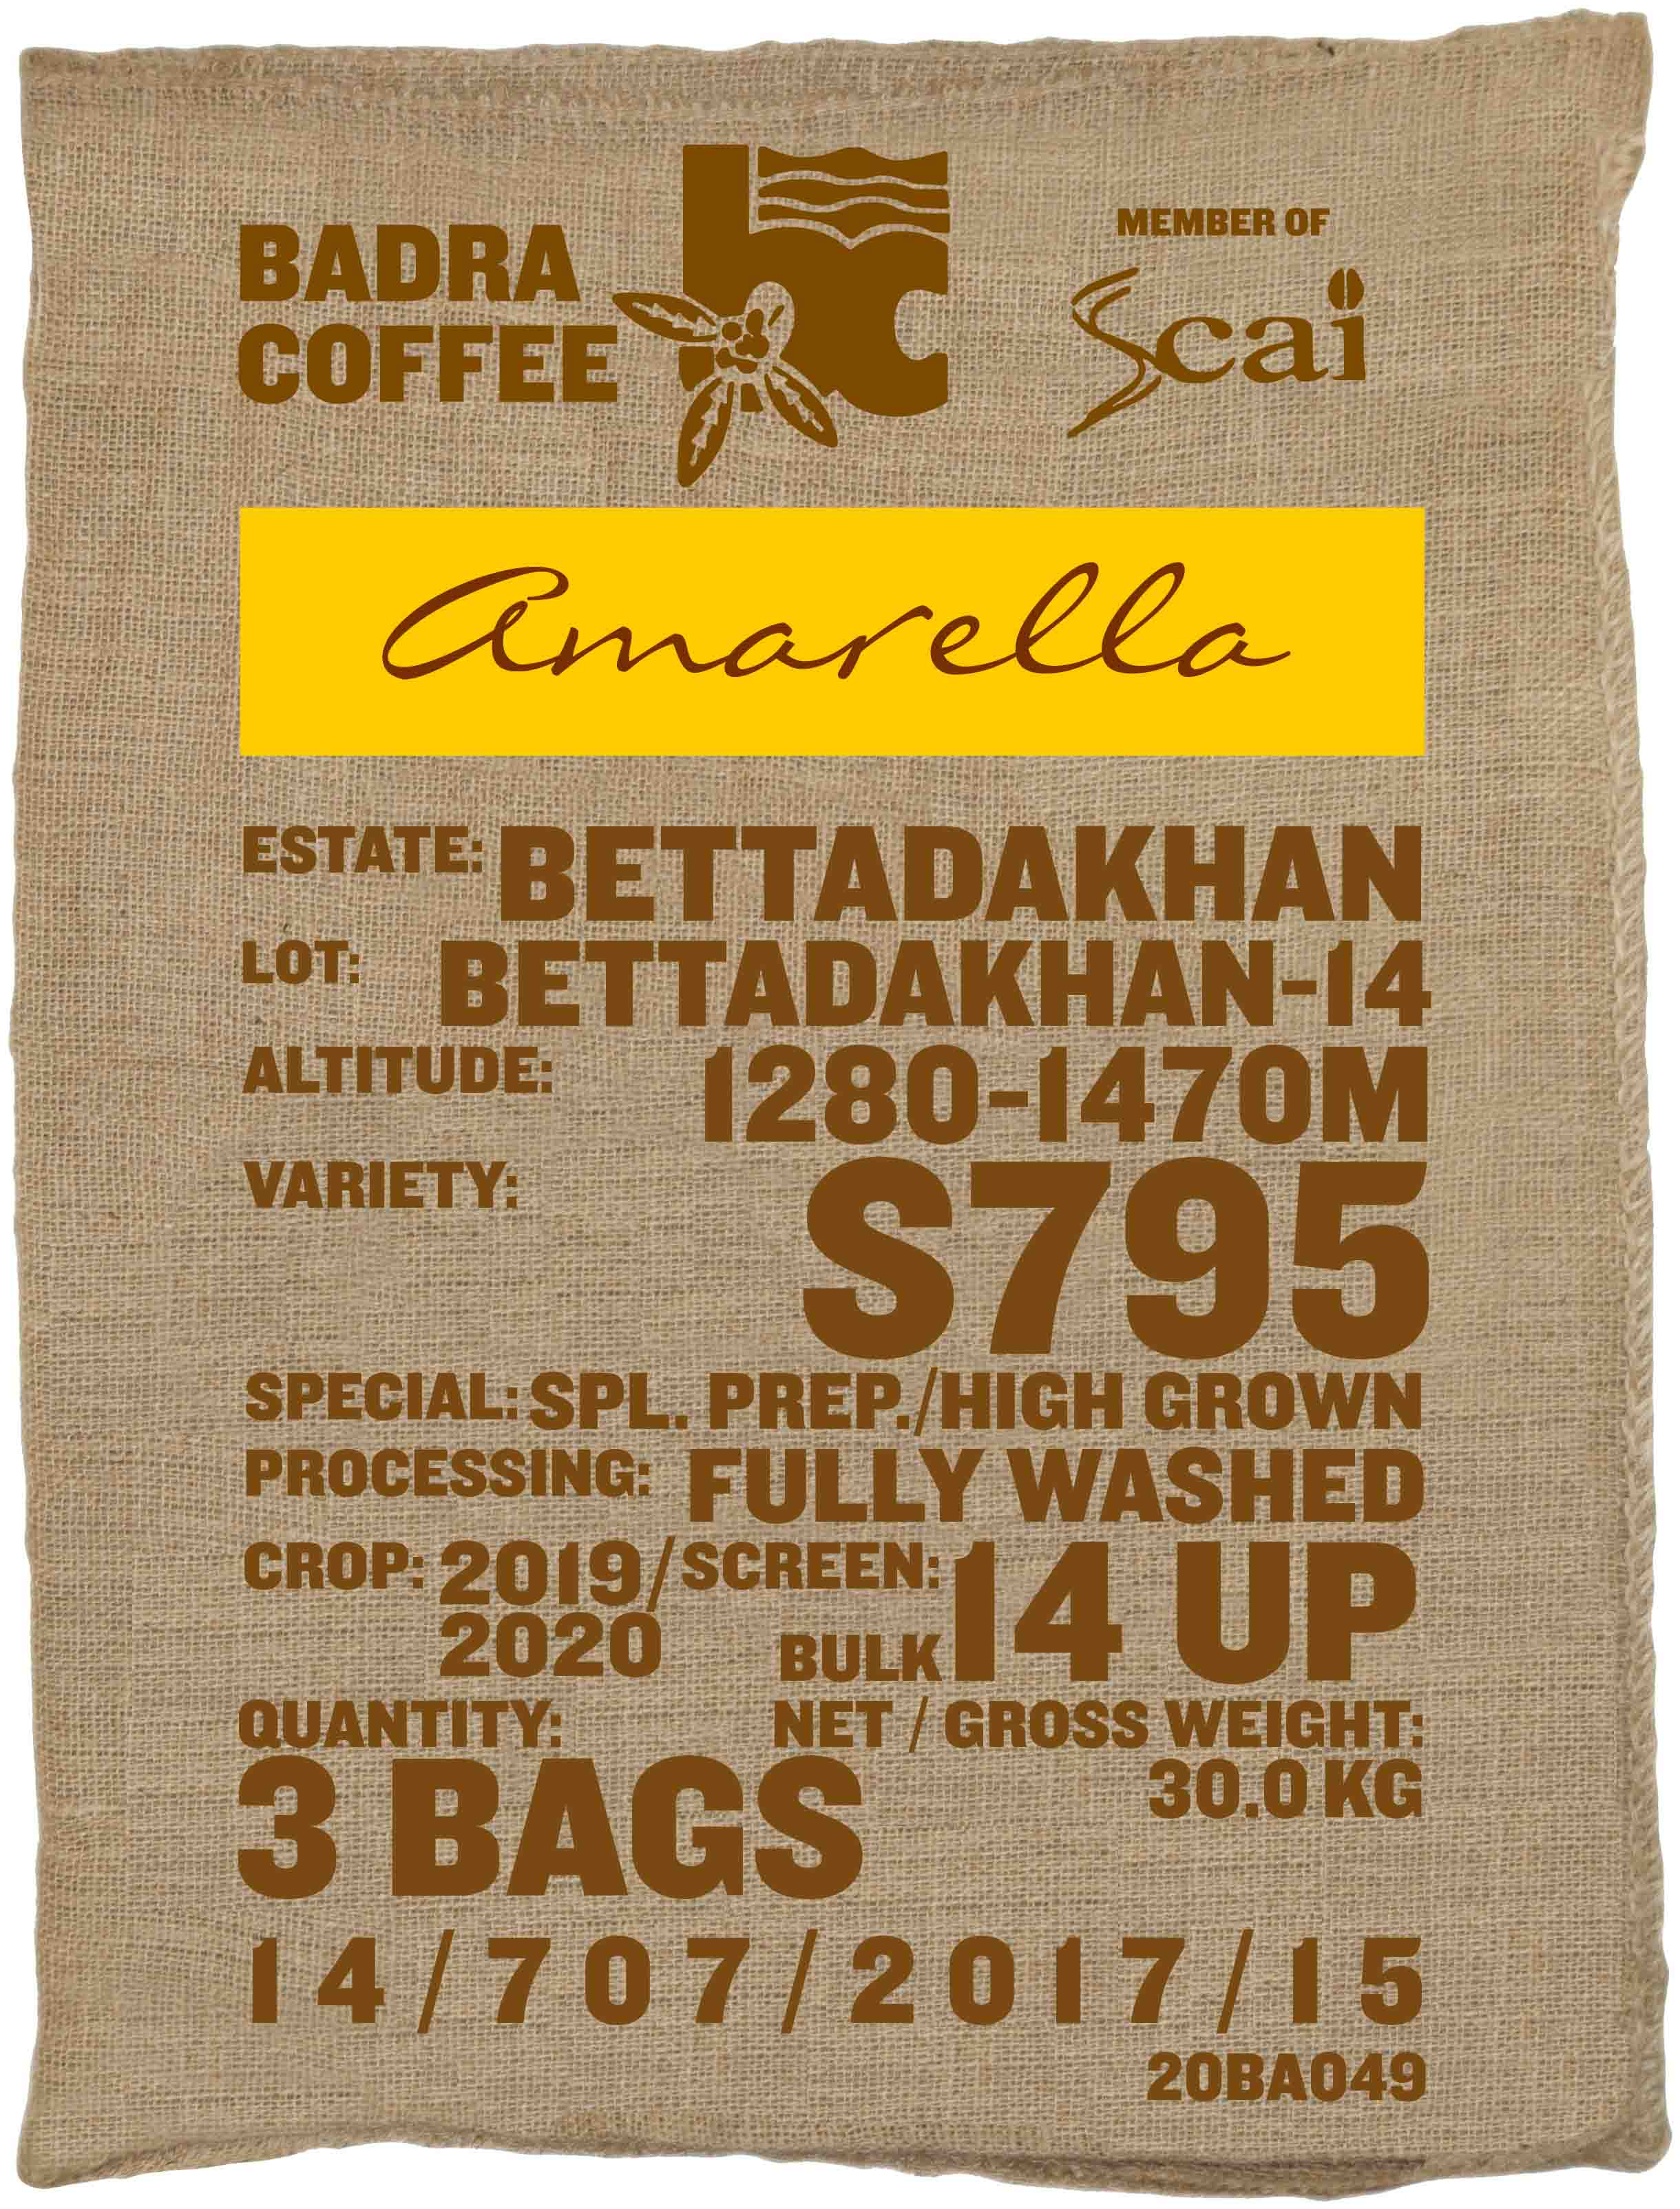 Ein Rohkaffeesack amarella Parzellenkaffee Varietät S795. Badra Estates Lot Bettadakhan 14.